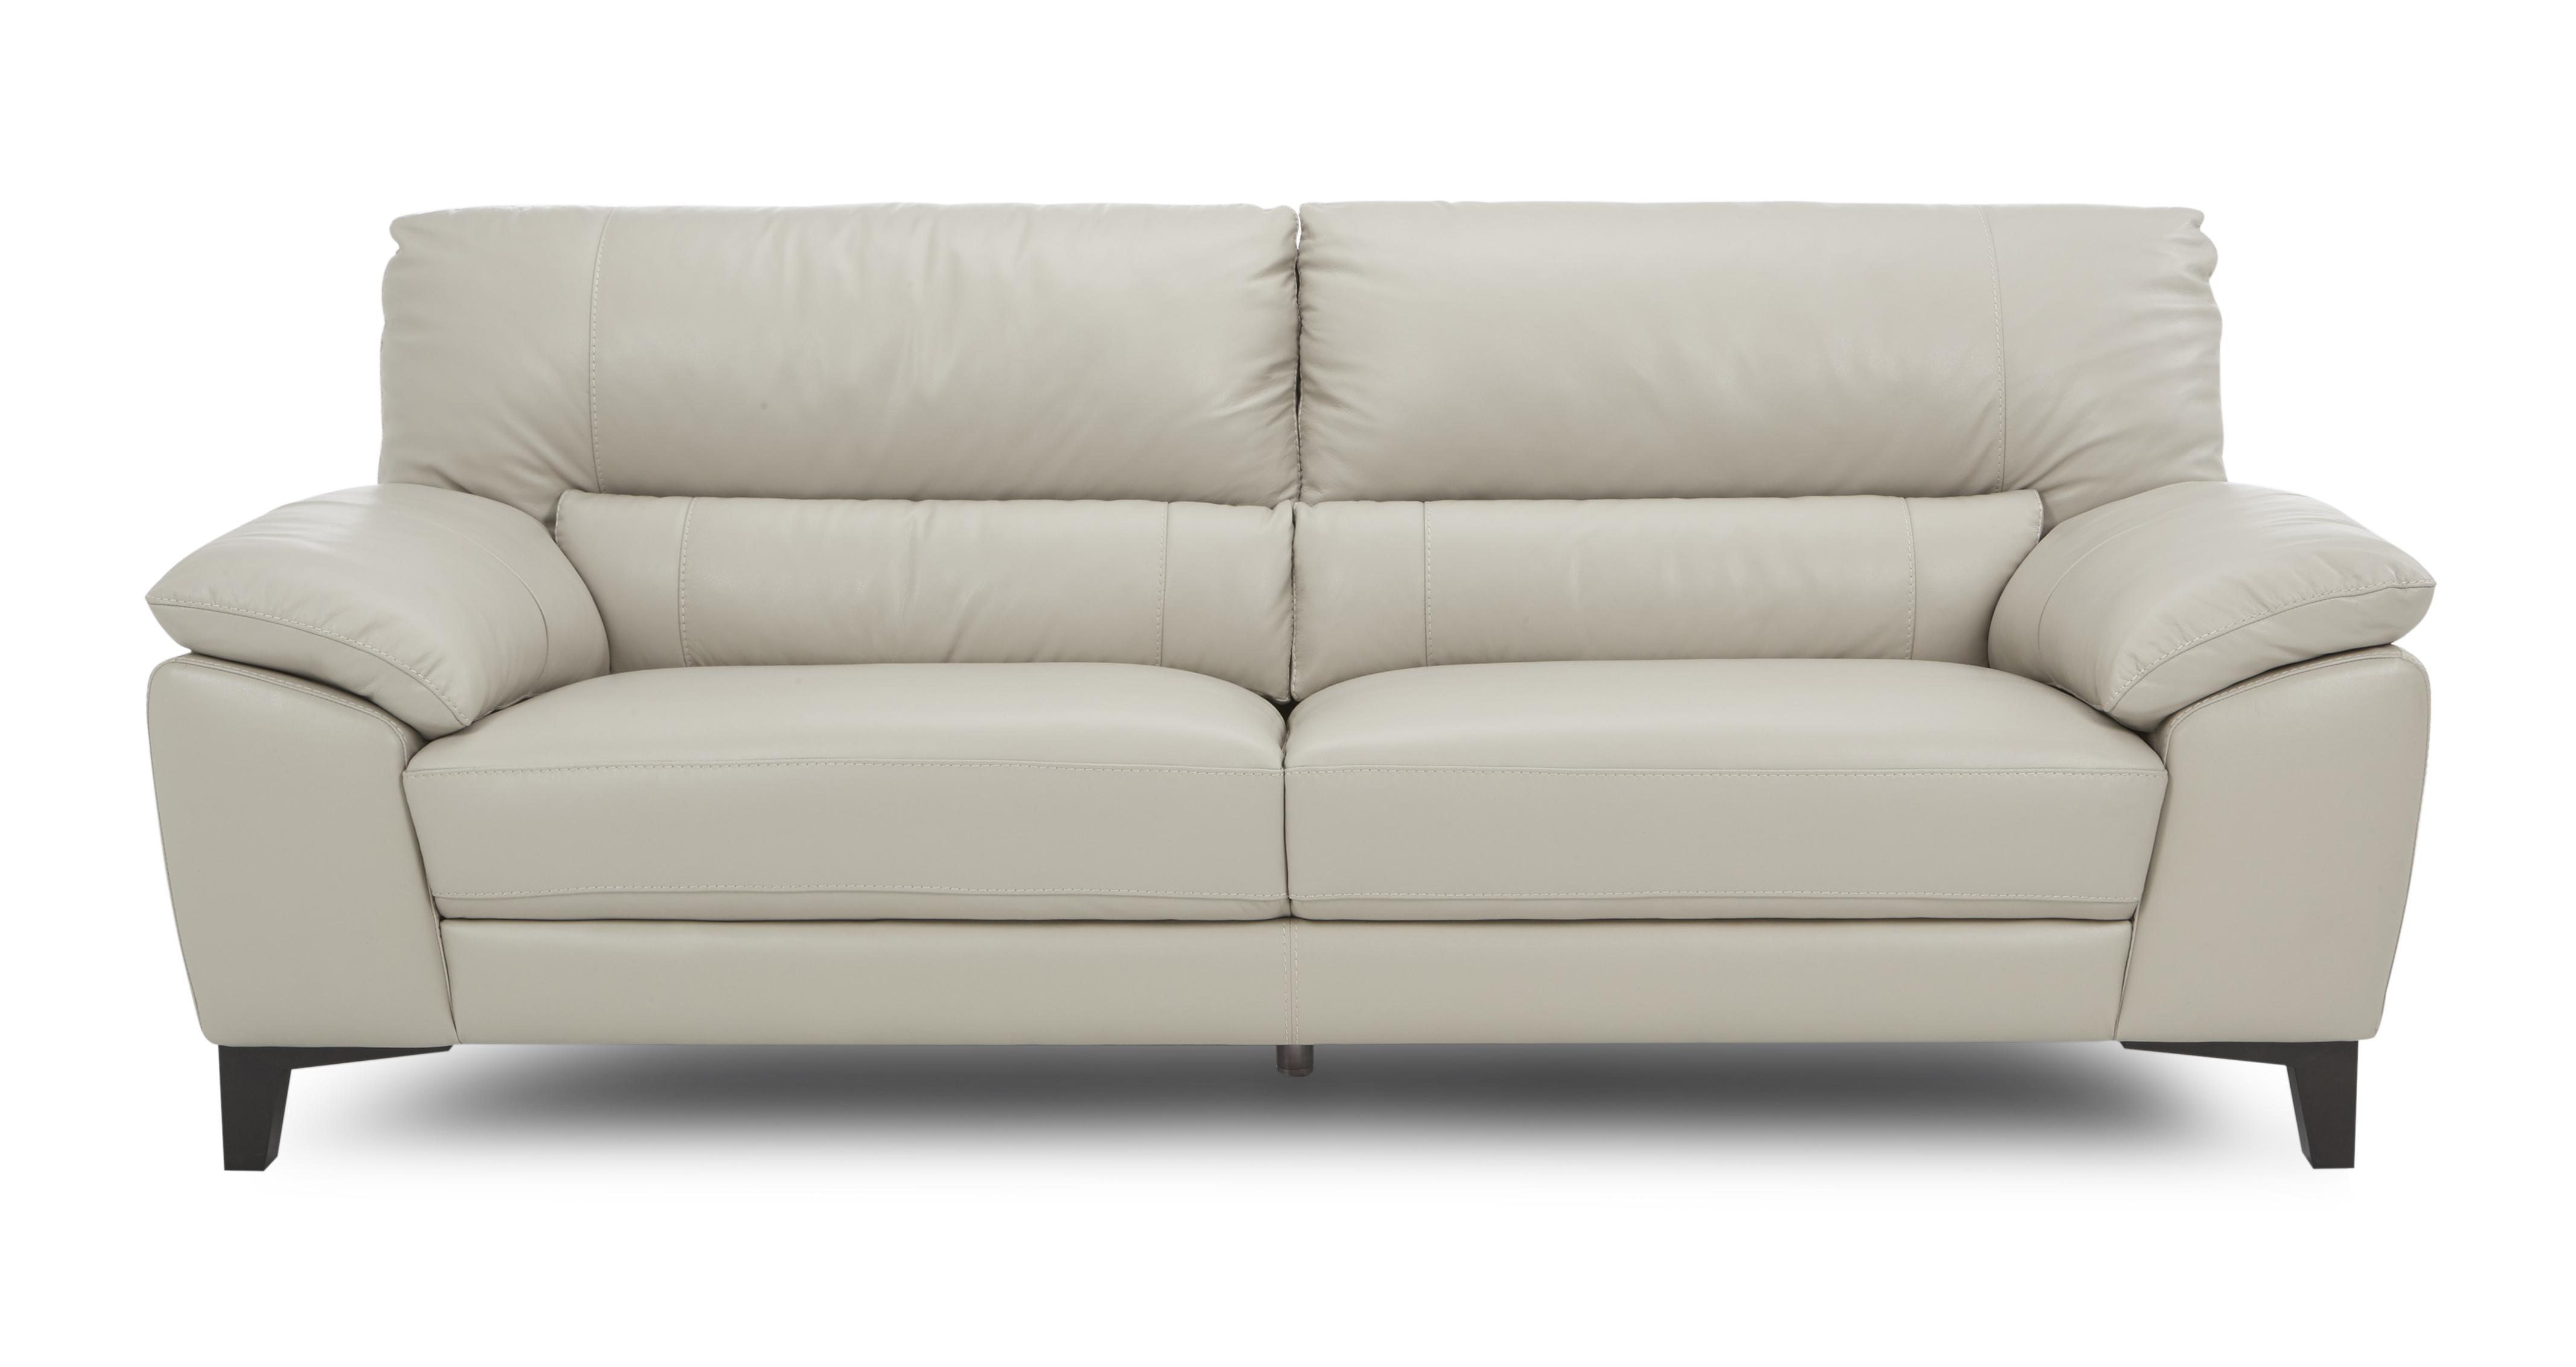 3 2 leather sofa deals - 3 2 Leather Sofa Deals 59